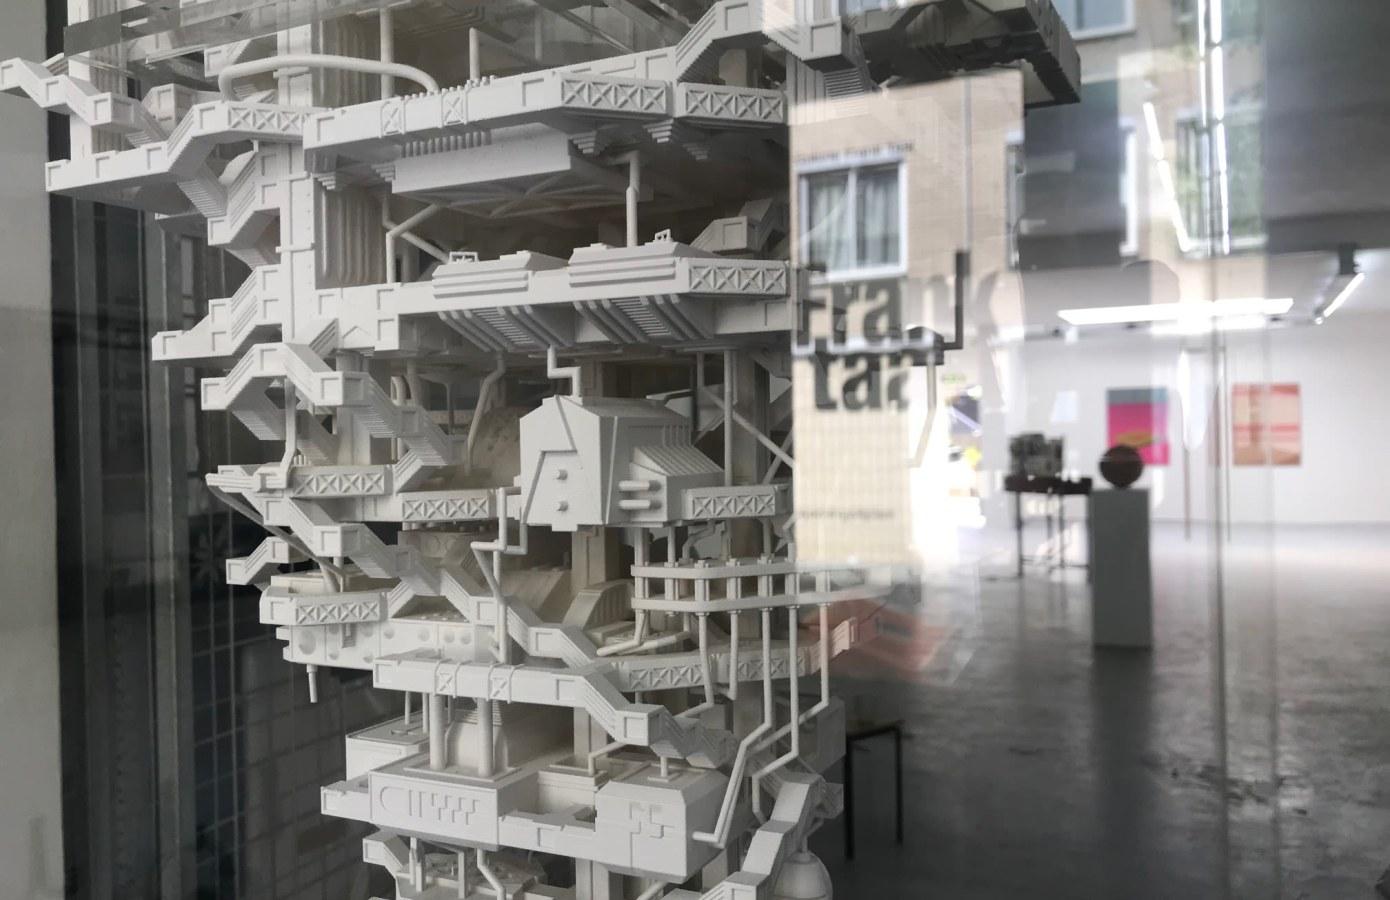 Architecture of Art, Bram Braam, Saminte Ekeland, Boris Maas, Dwight Marica, Mike Ottink, Erik Sep, Sandro Setola, Tom Woestenborghs,